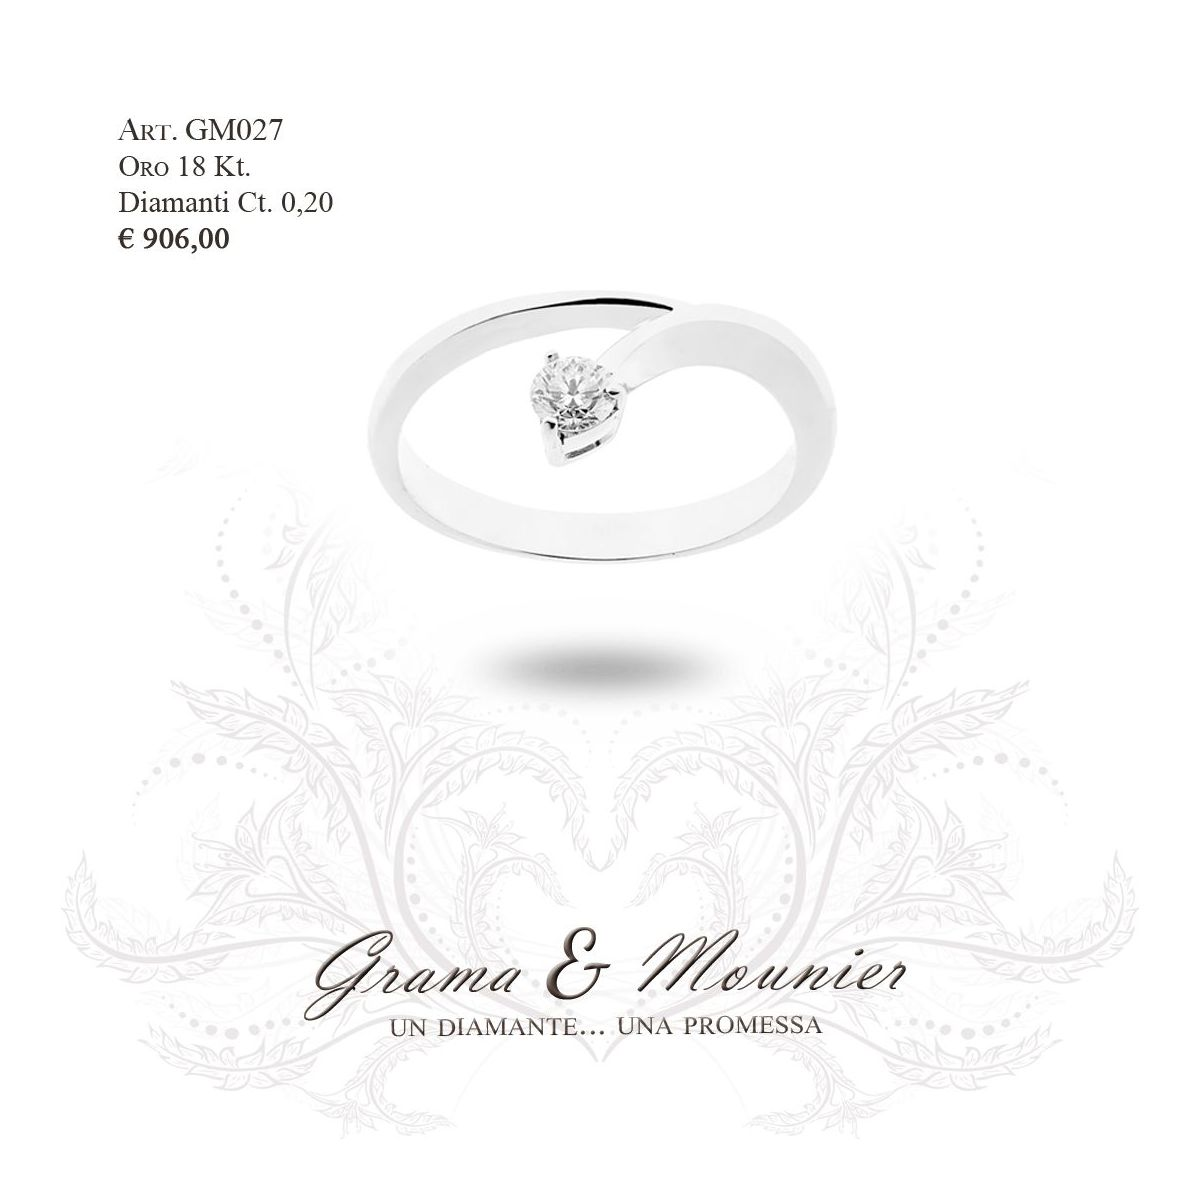 Anello in oro 18Kt. Grama&Mounier Art.GM027